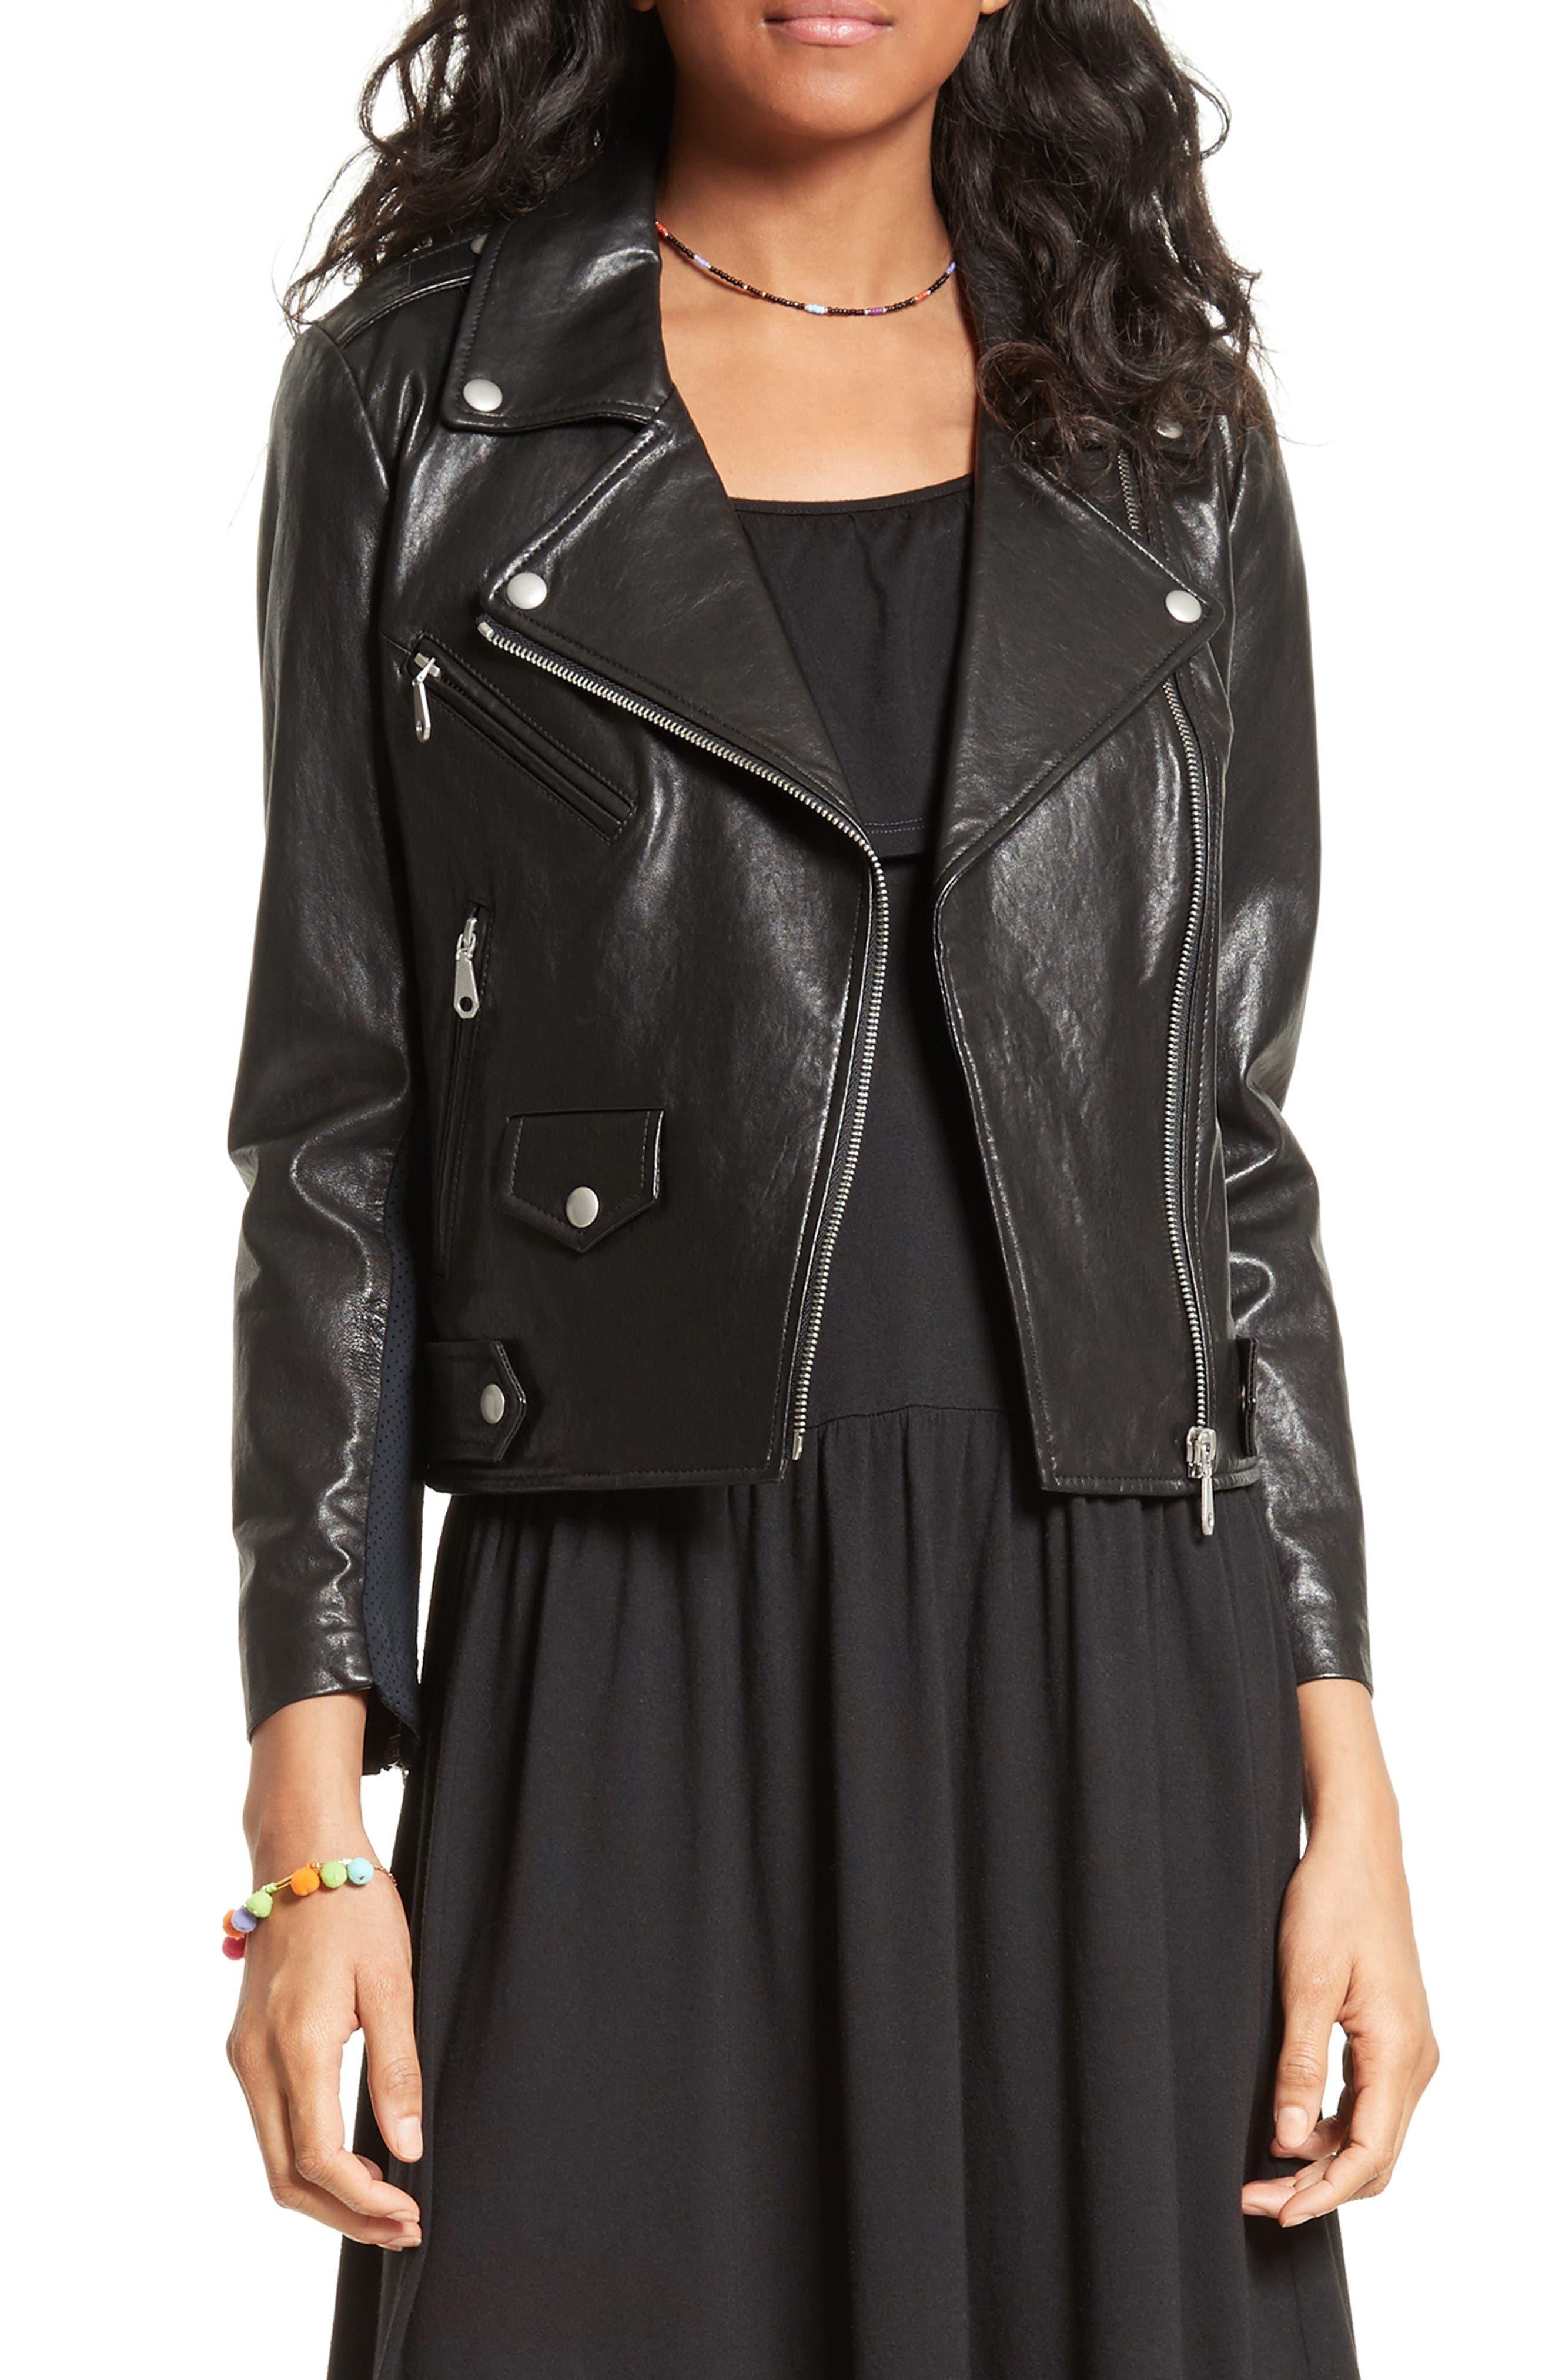 Alternate Image 1 Selected - Rebecca Minkoff Wes Moto Leather & Neoprene Jacket